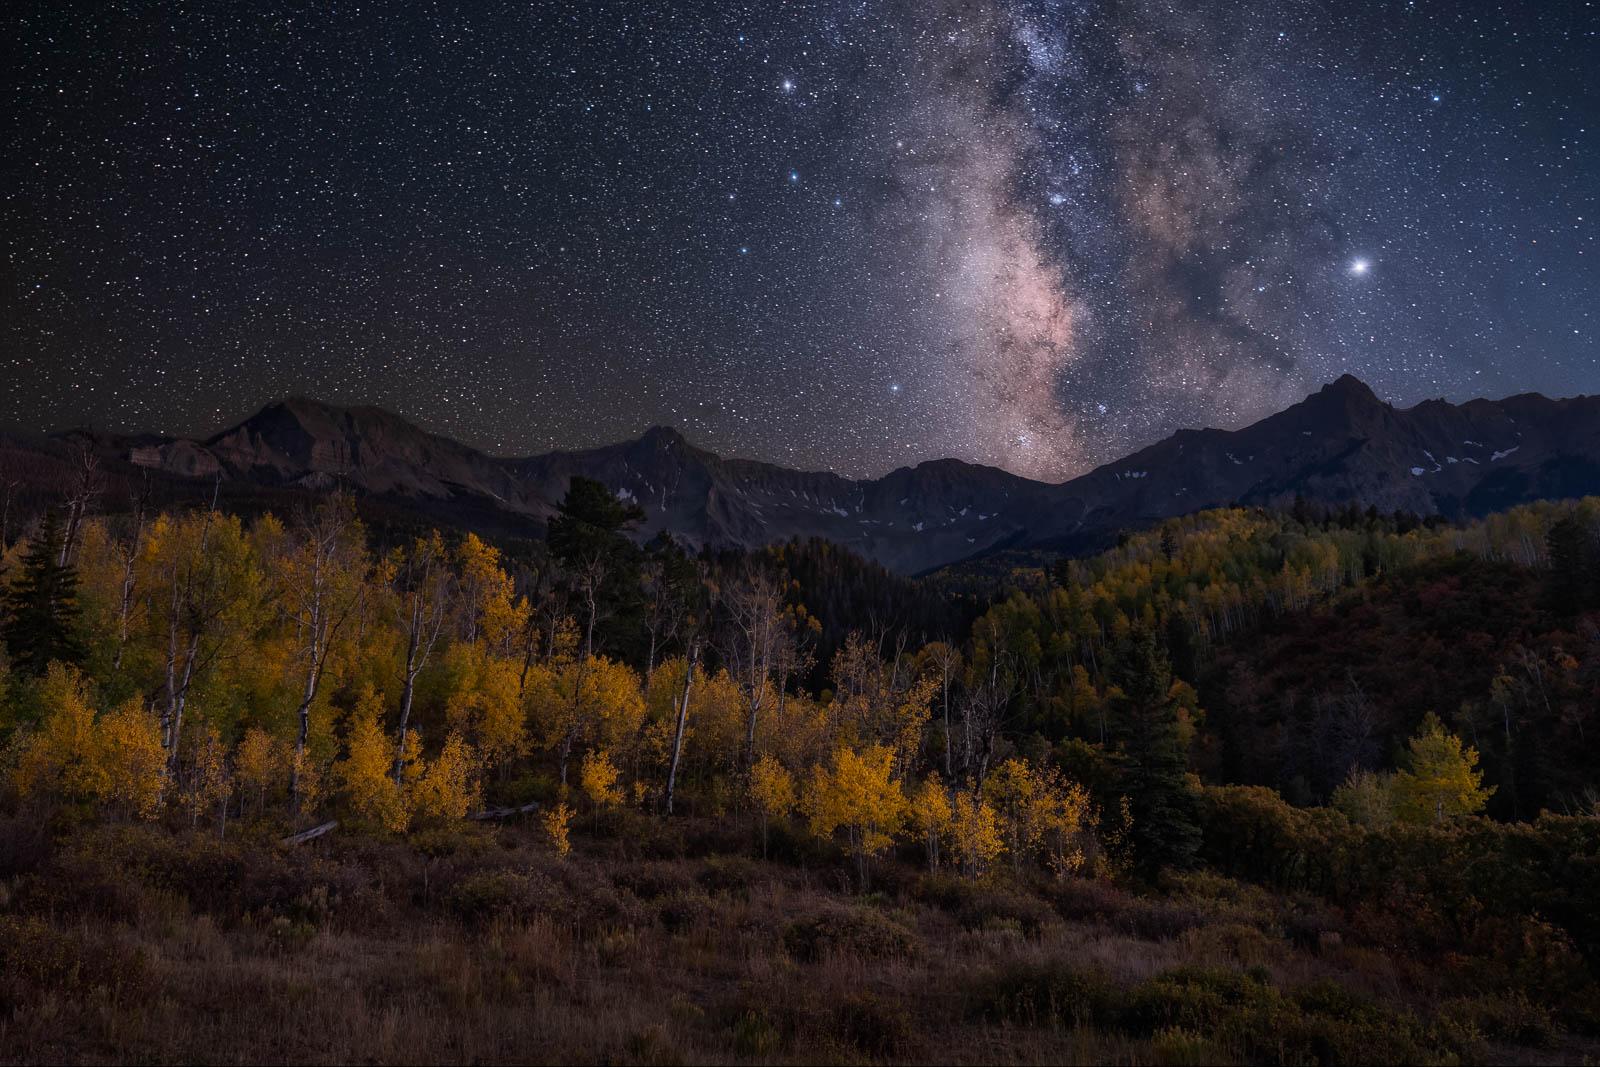 aspen, black, blue, colorado, landscape orientation, milky way, rocky mountains, san juan mountains, stars, tree, yellow